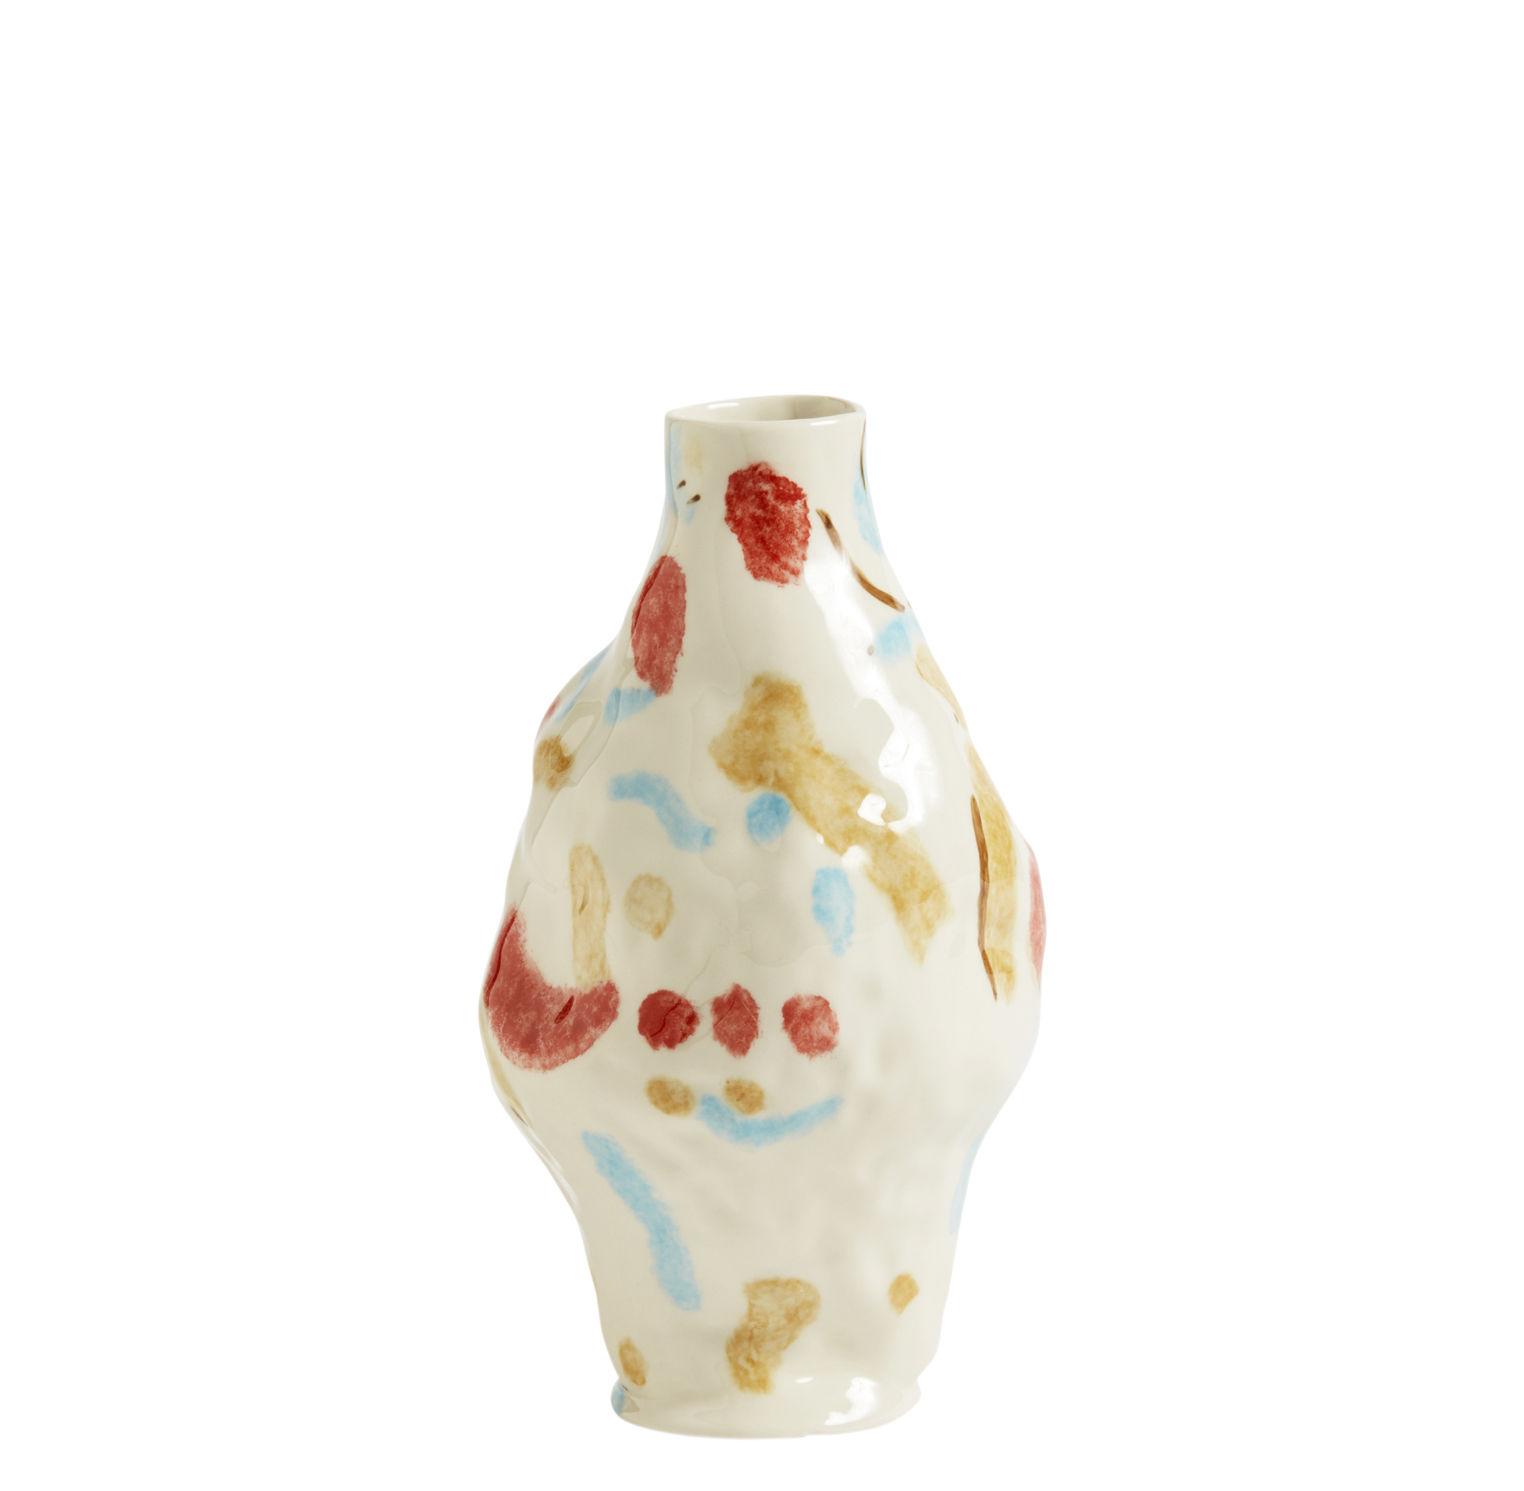 Decoration - Vases - Miro Vase - / Hand-made - Sandstone by Hay - White / Coloured patterns - Sandstone